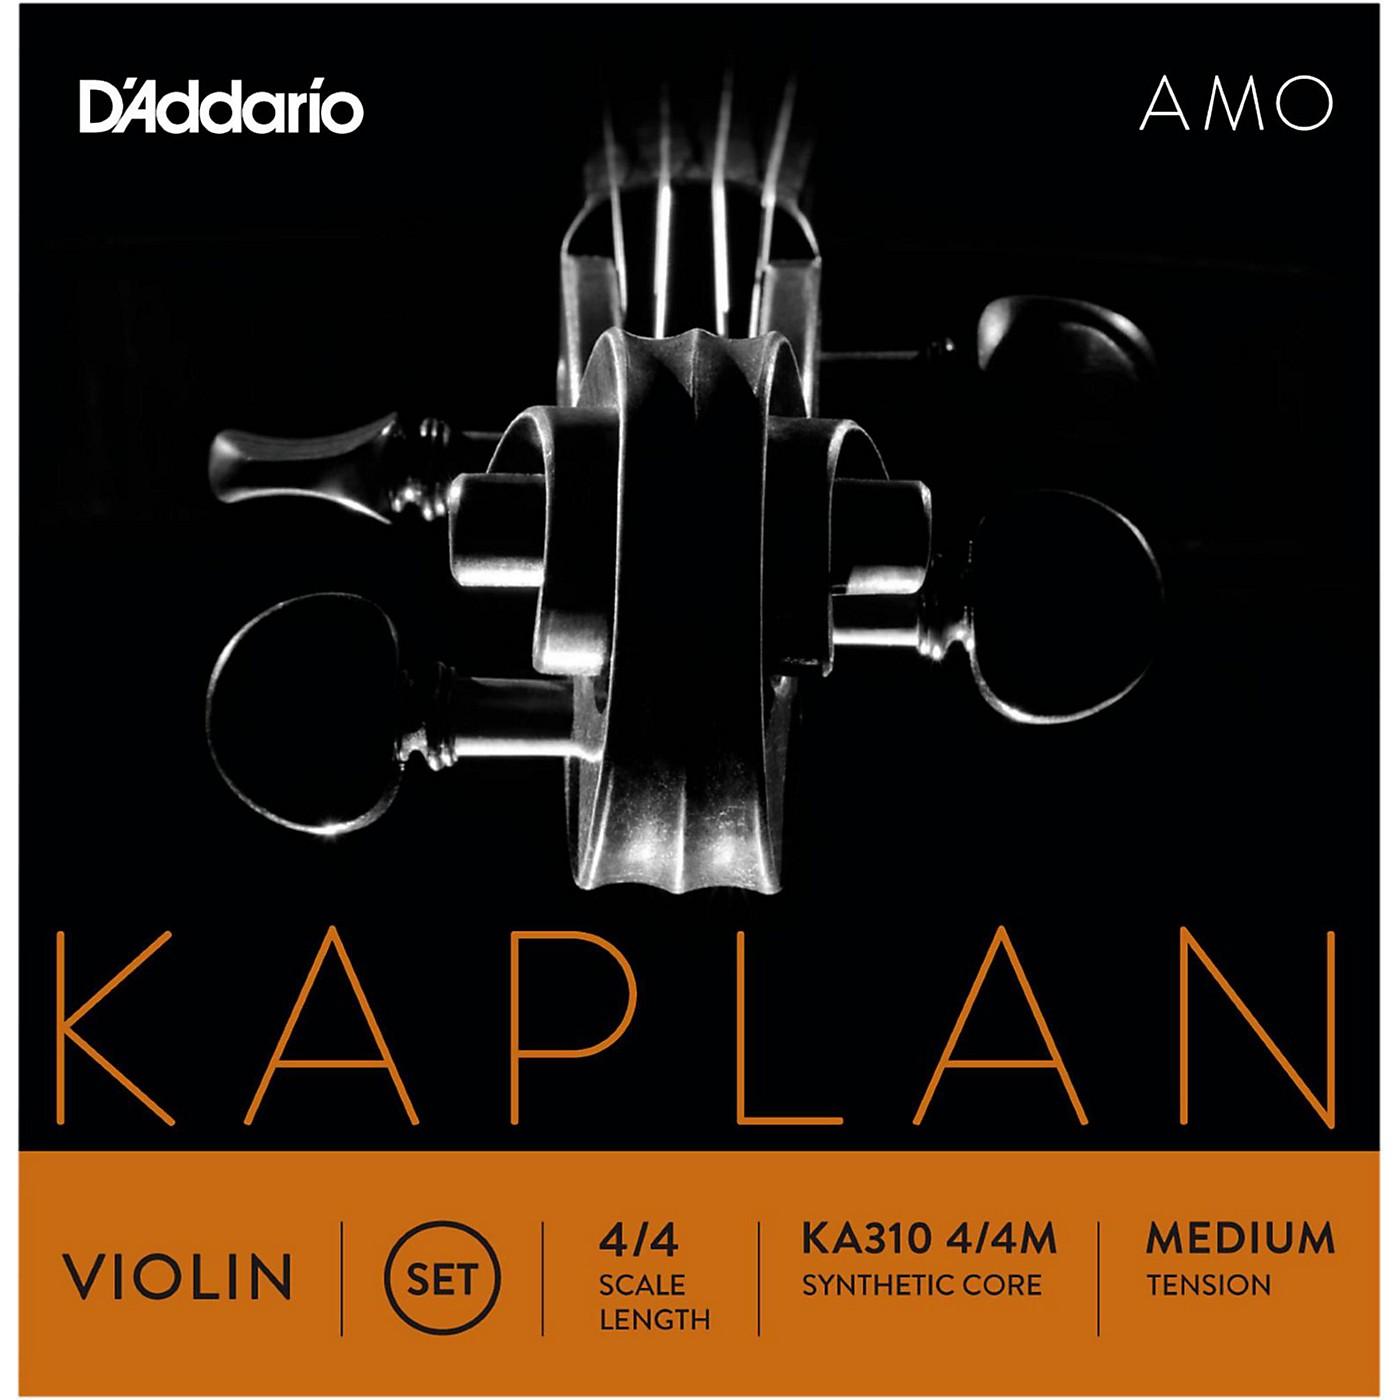 D'Addario Kaplan Amo Series Violin String Set thumbnail